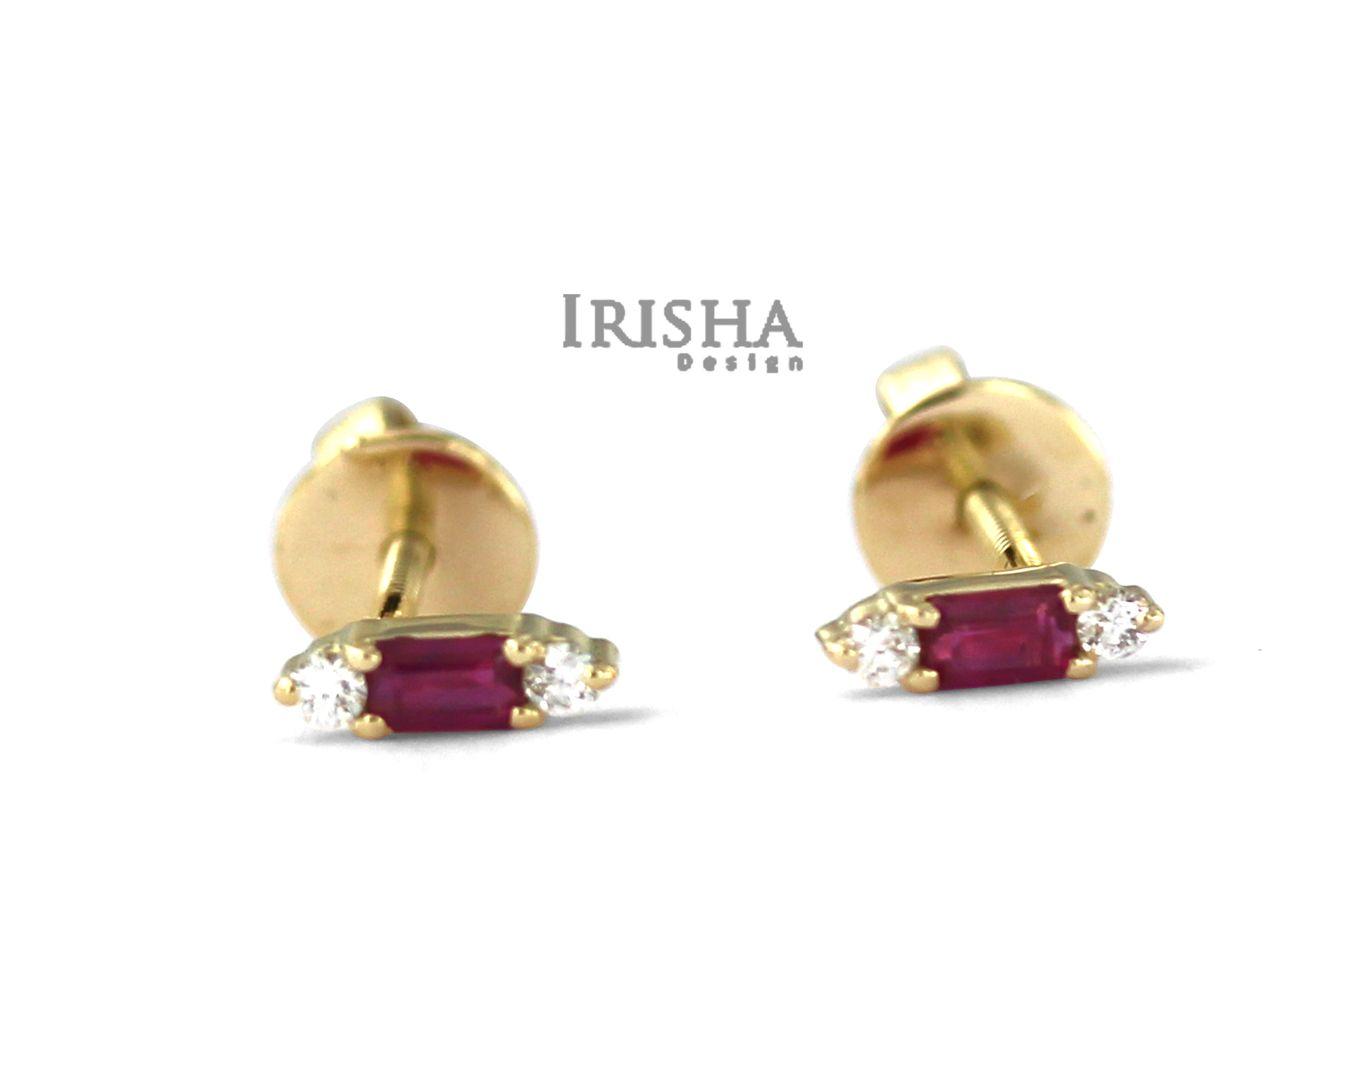 14K Gold Genuine Diamond And Baguette Ruby Gemstone Studs Earrings Fine Jewelry